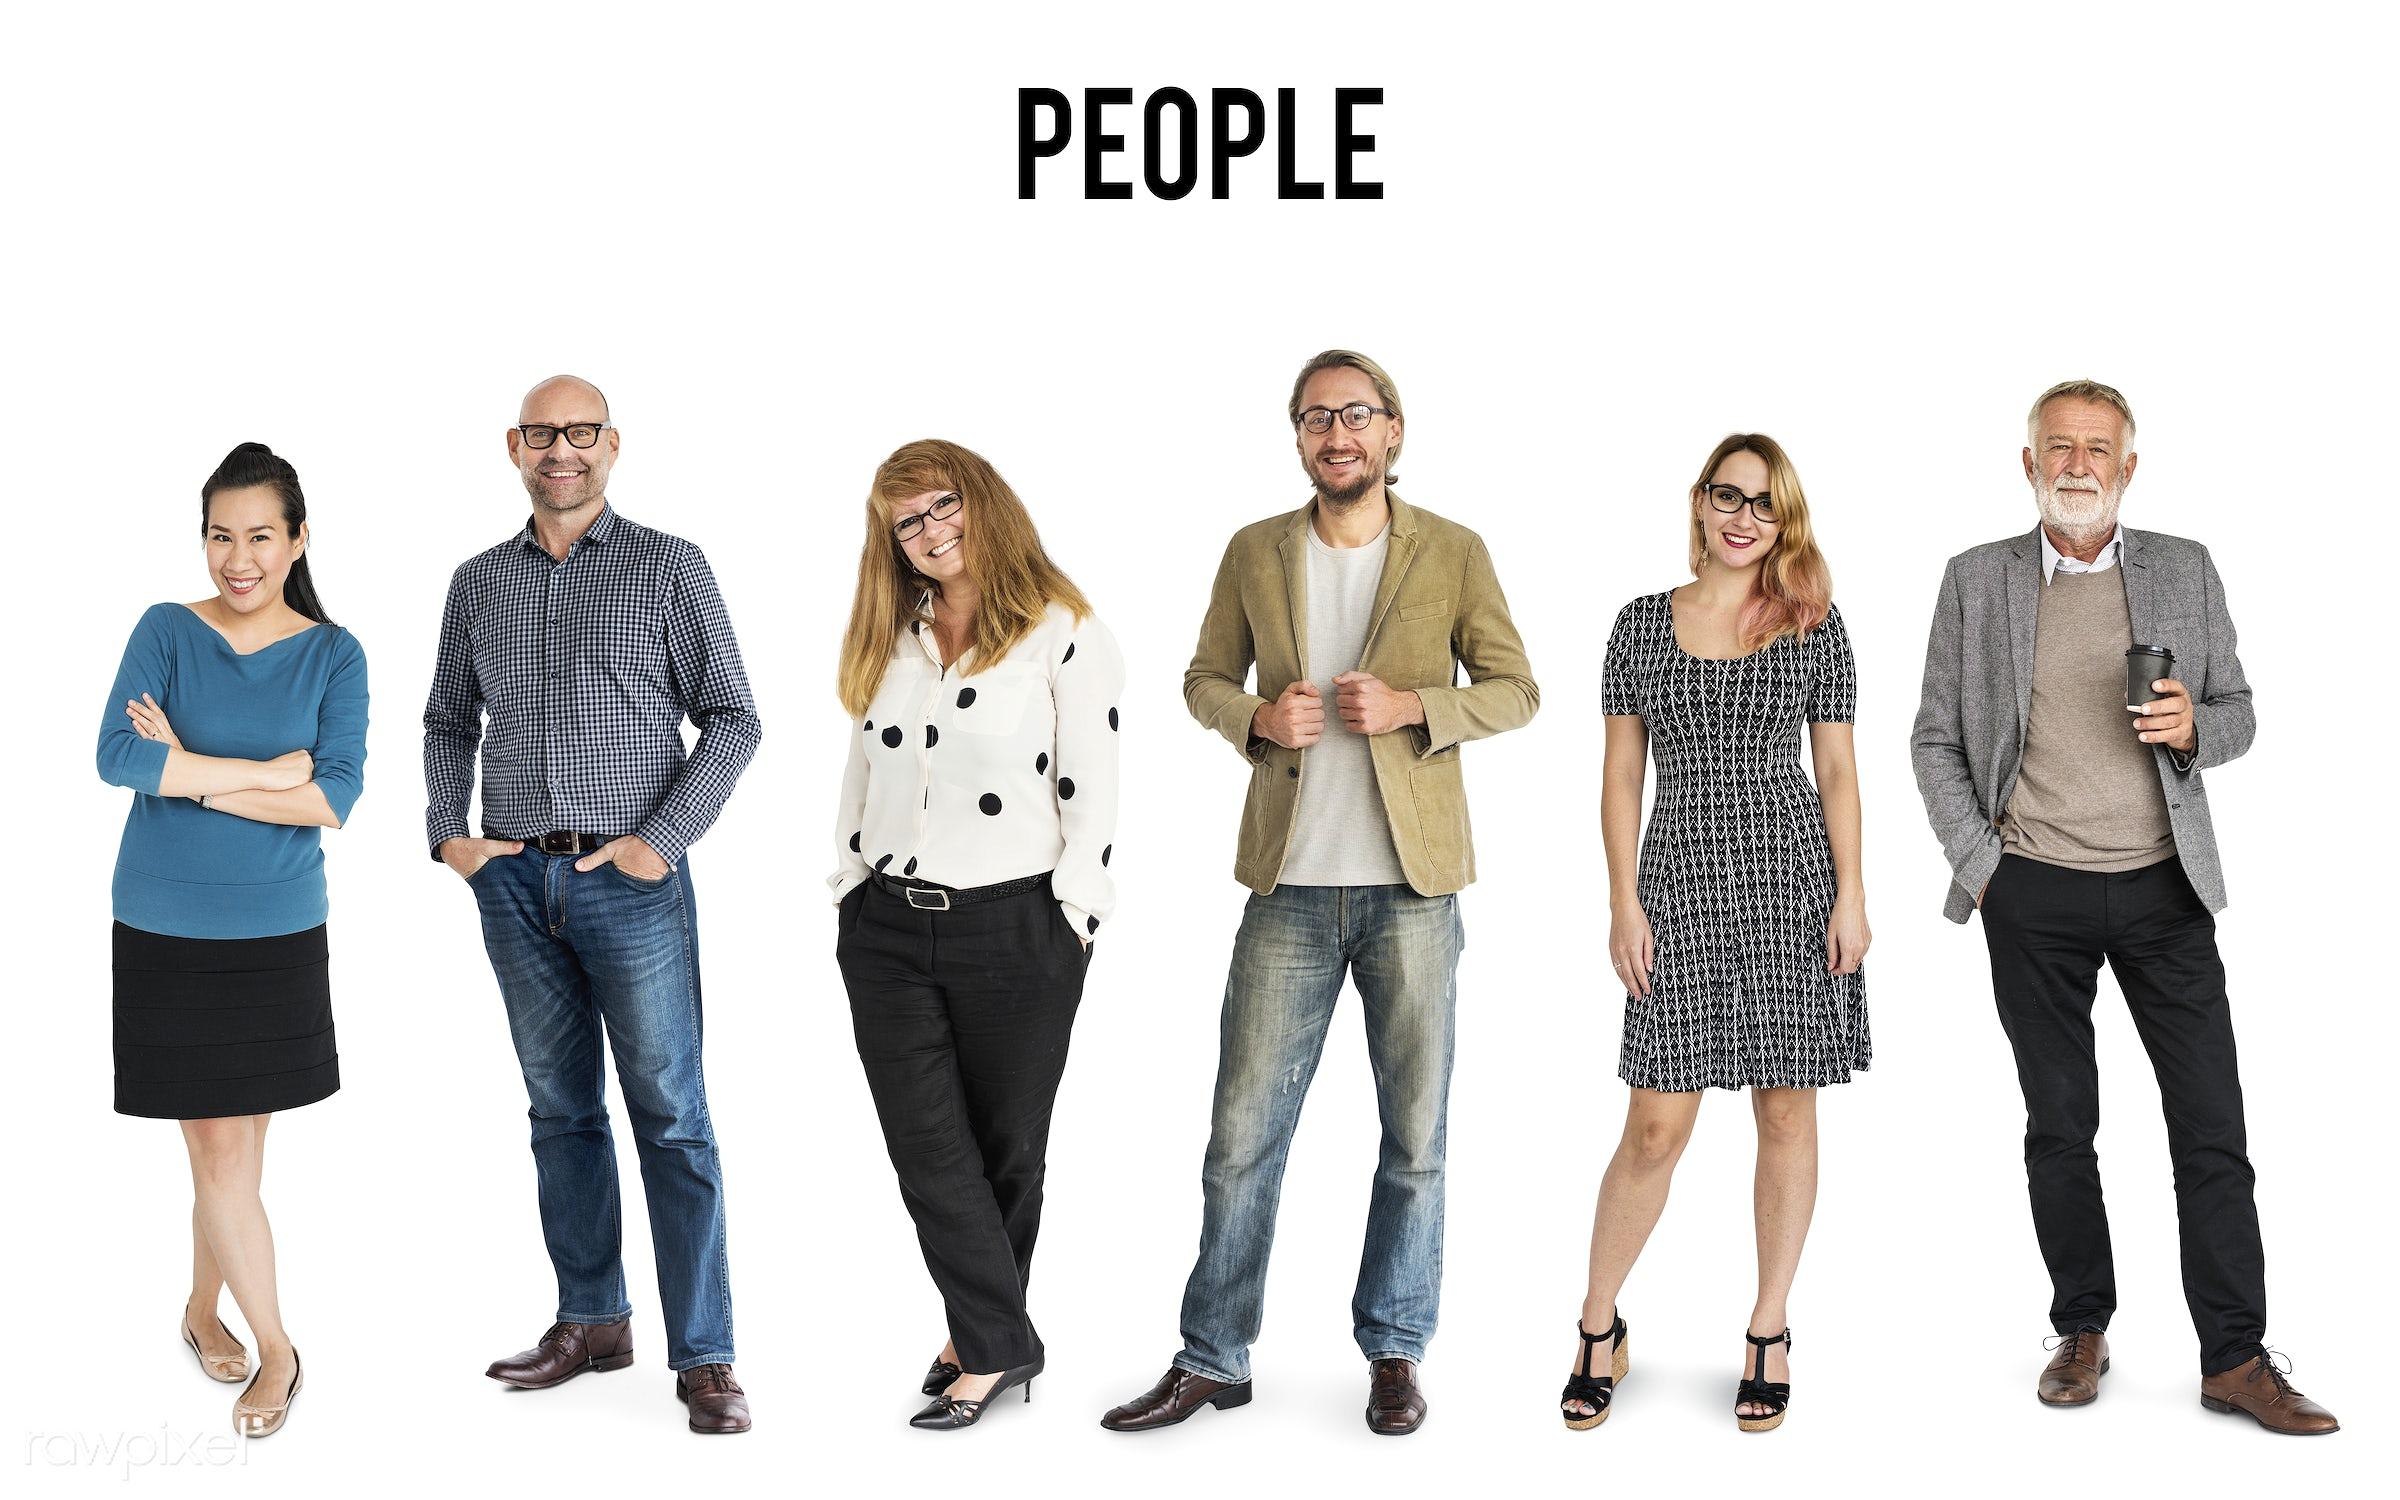 Diverse people set - gentlemen, studio, person, diverse, set, retired, retire, people, attraction, together, caucasian,...